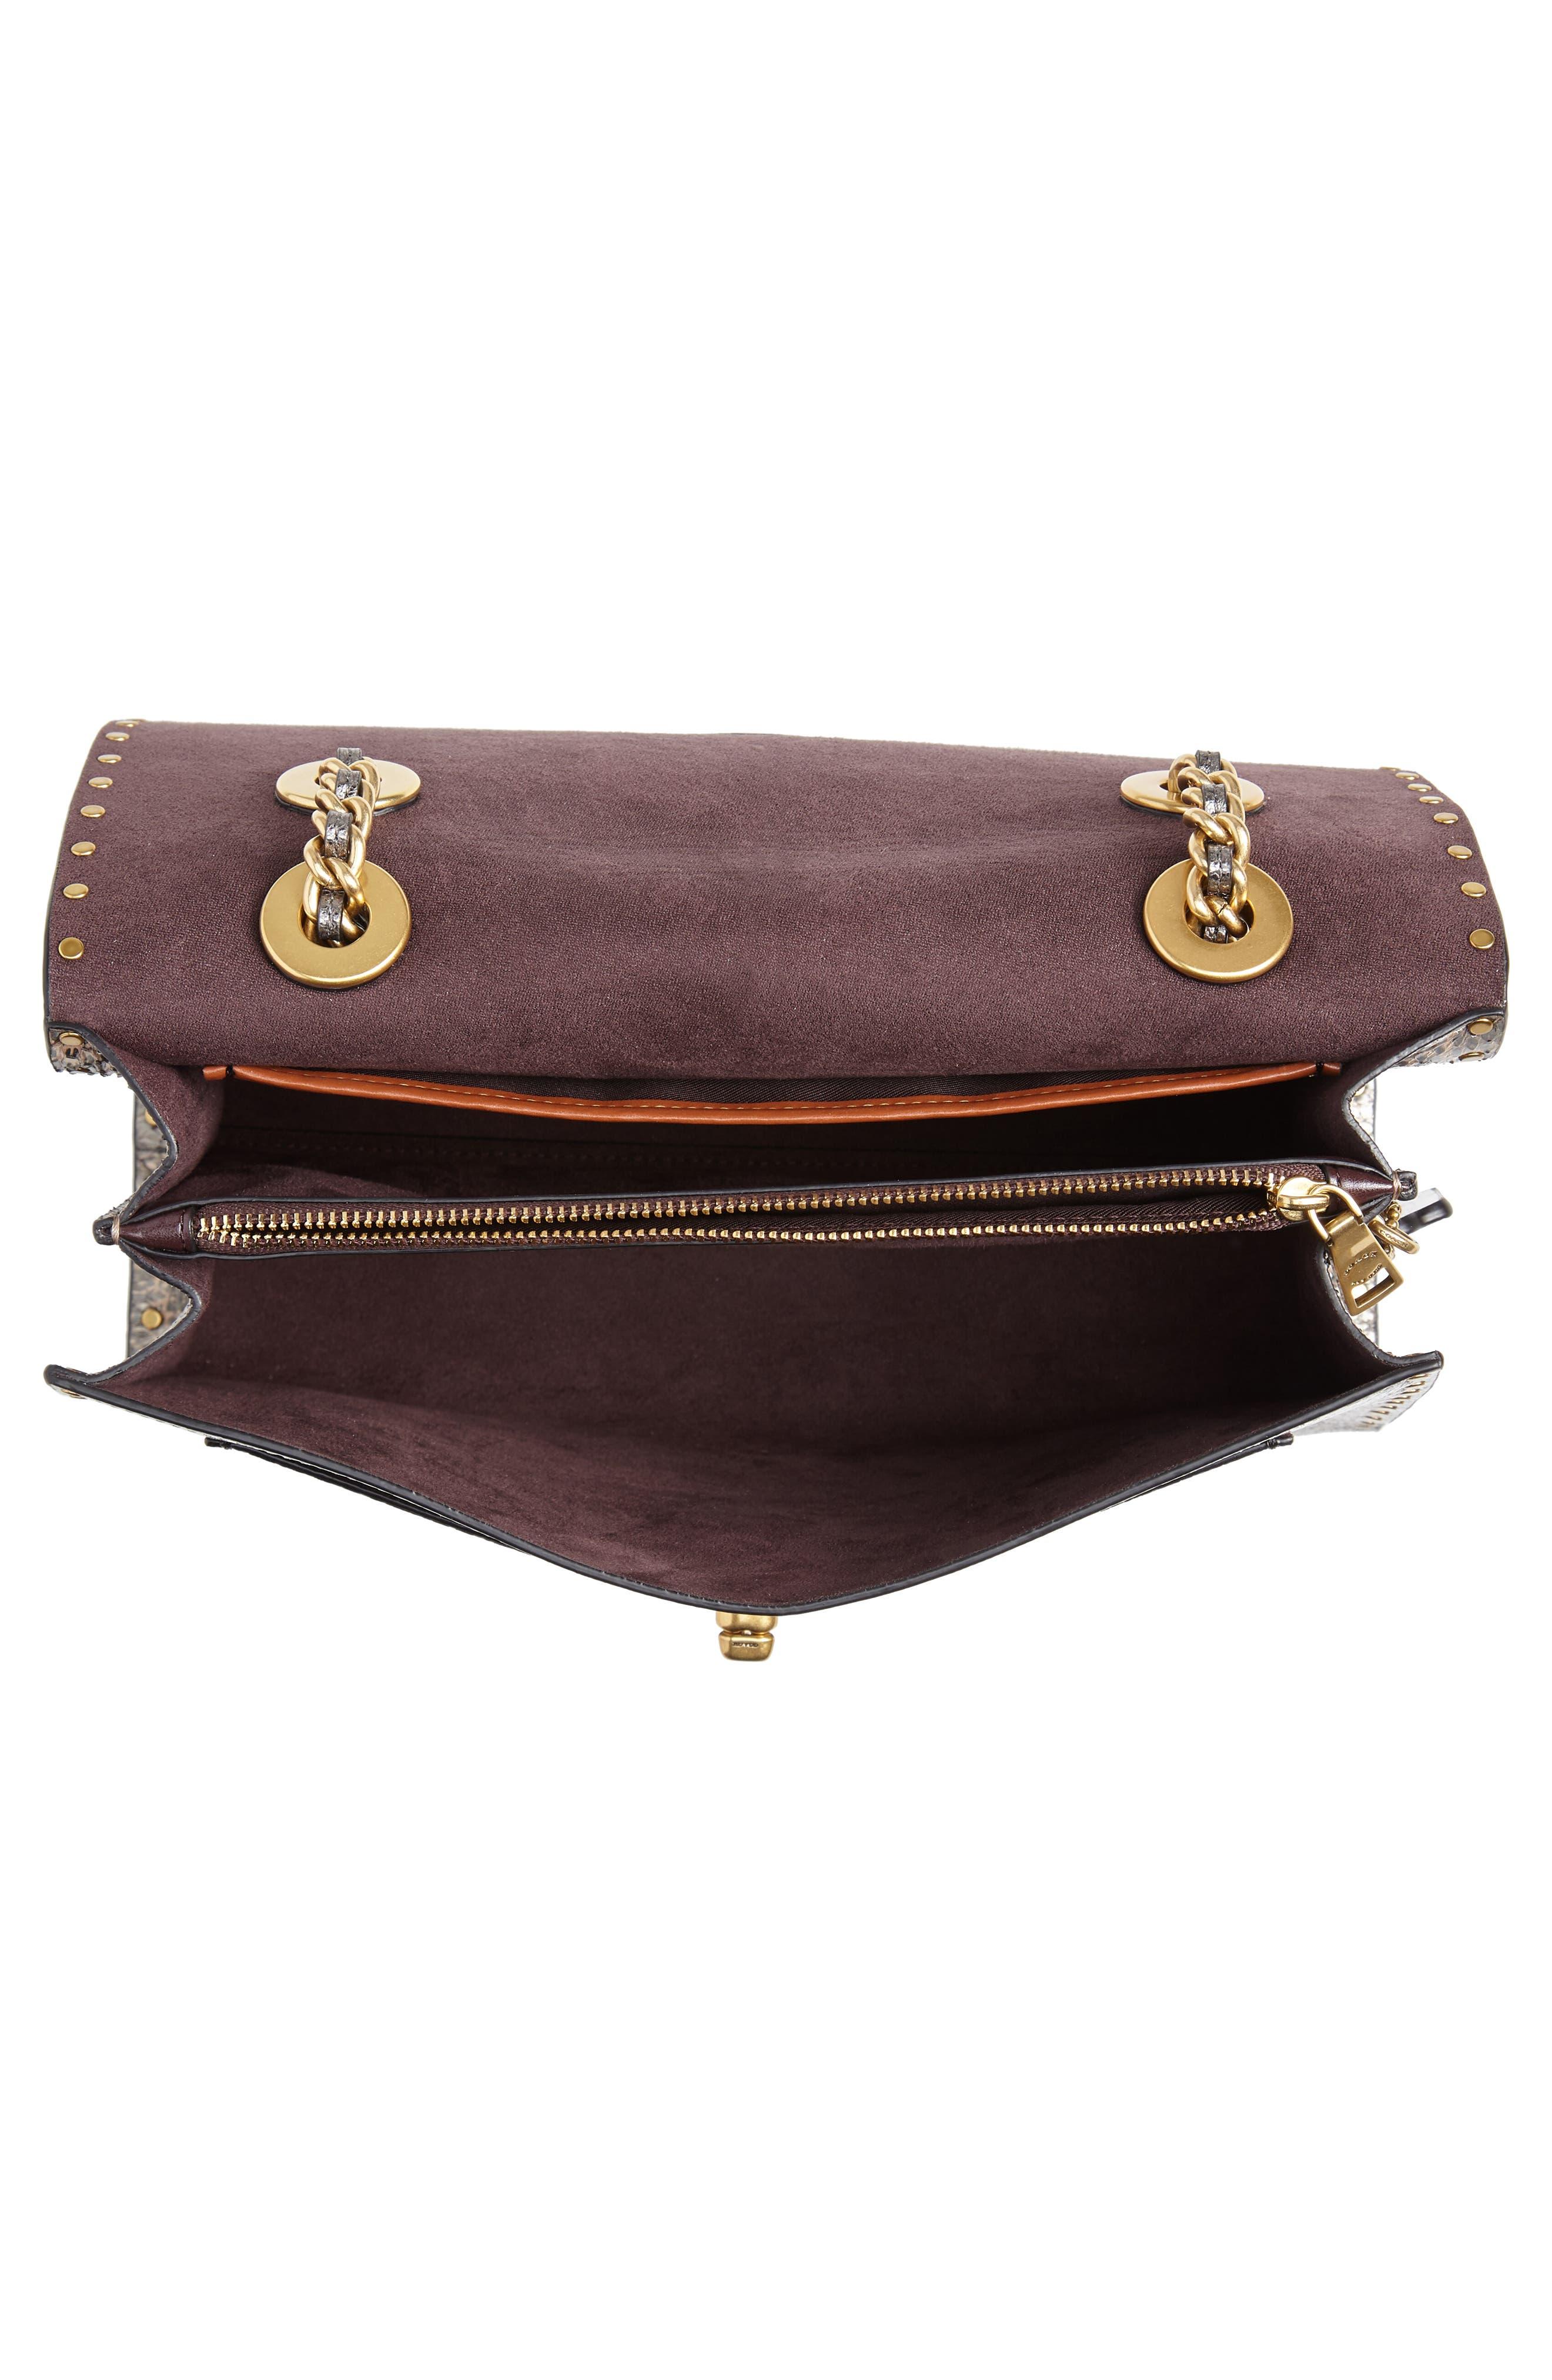 Signature Border Parker Leather & Genuine Snakeskin Shoulder Bag,                             Alternate thumbnail 4, color,                             CHARCOAL METALLIC GRAPHITE